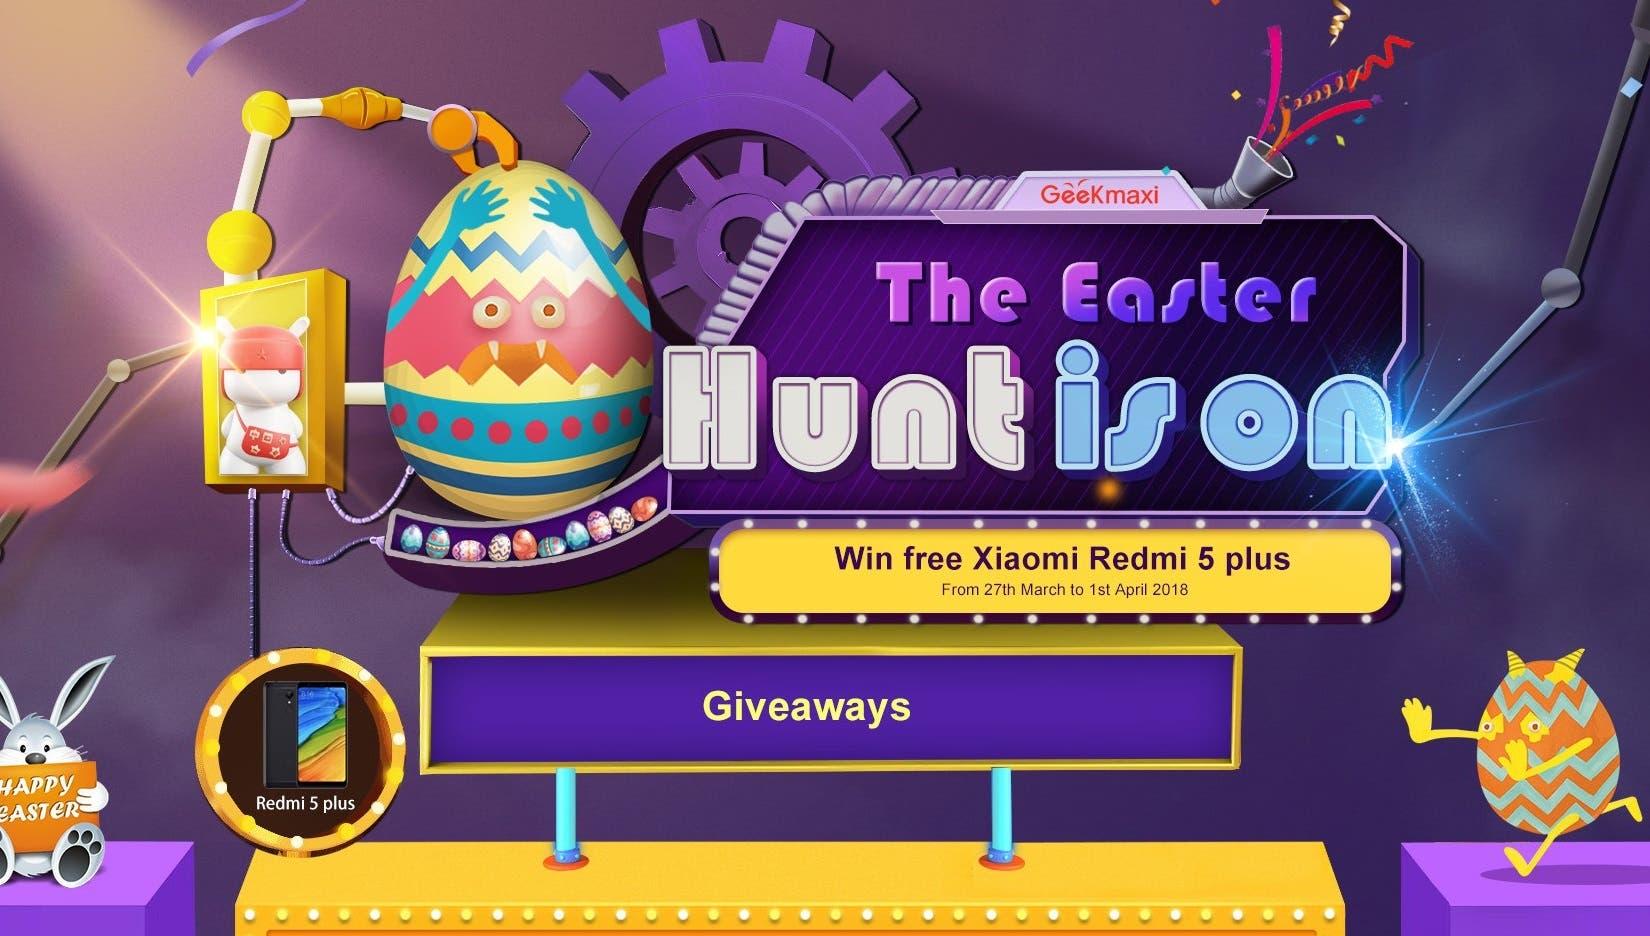 Geekmaxi's Easter Hunt